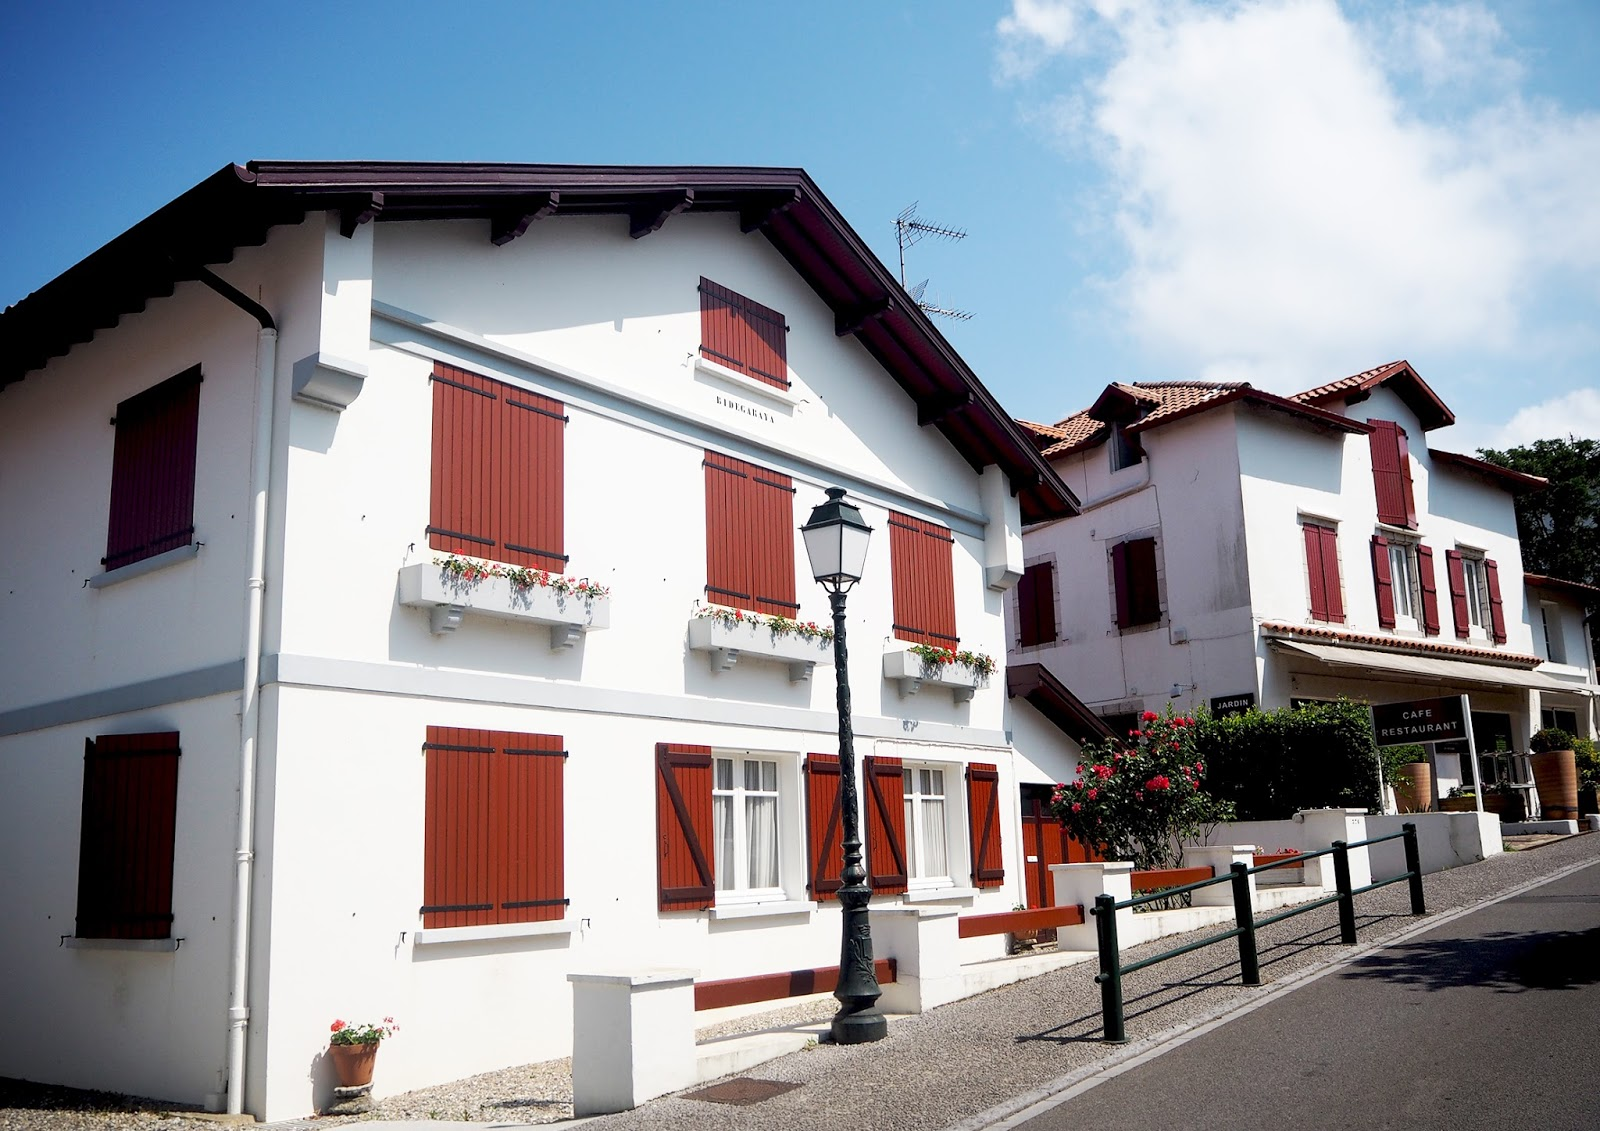 Maison typique Pays Basque Guéthary